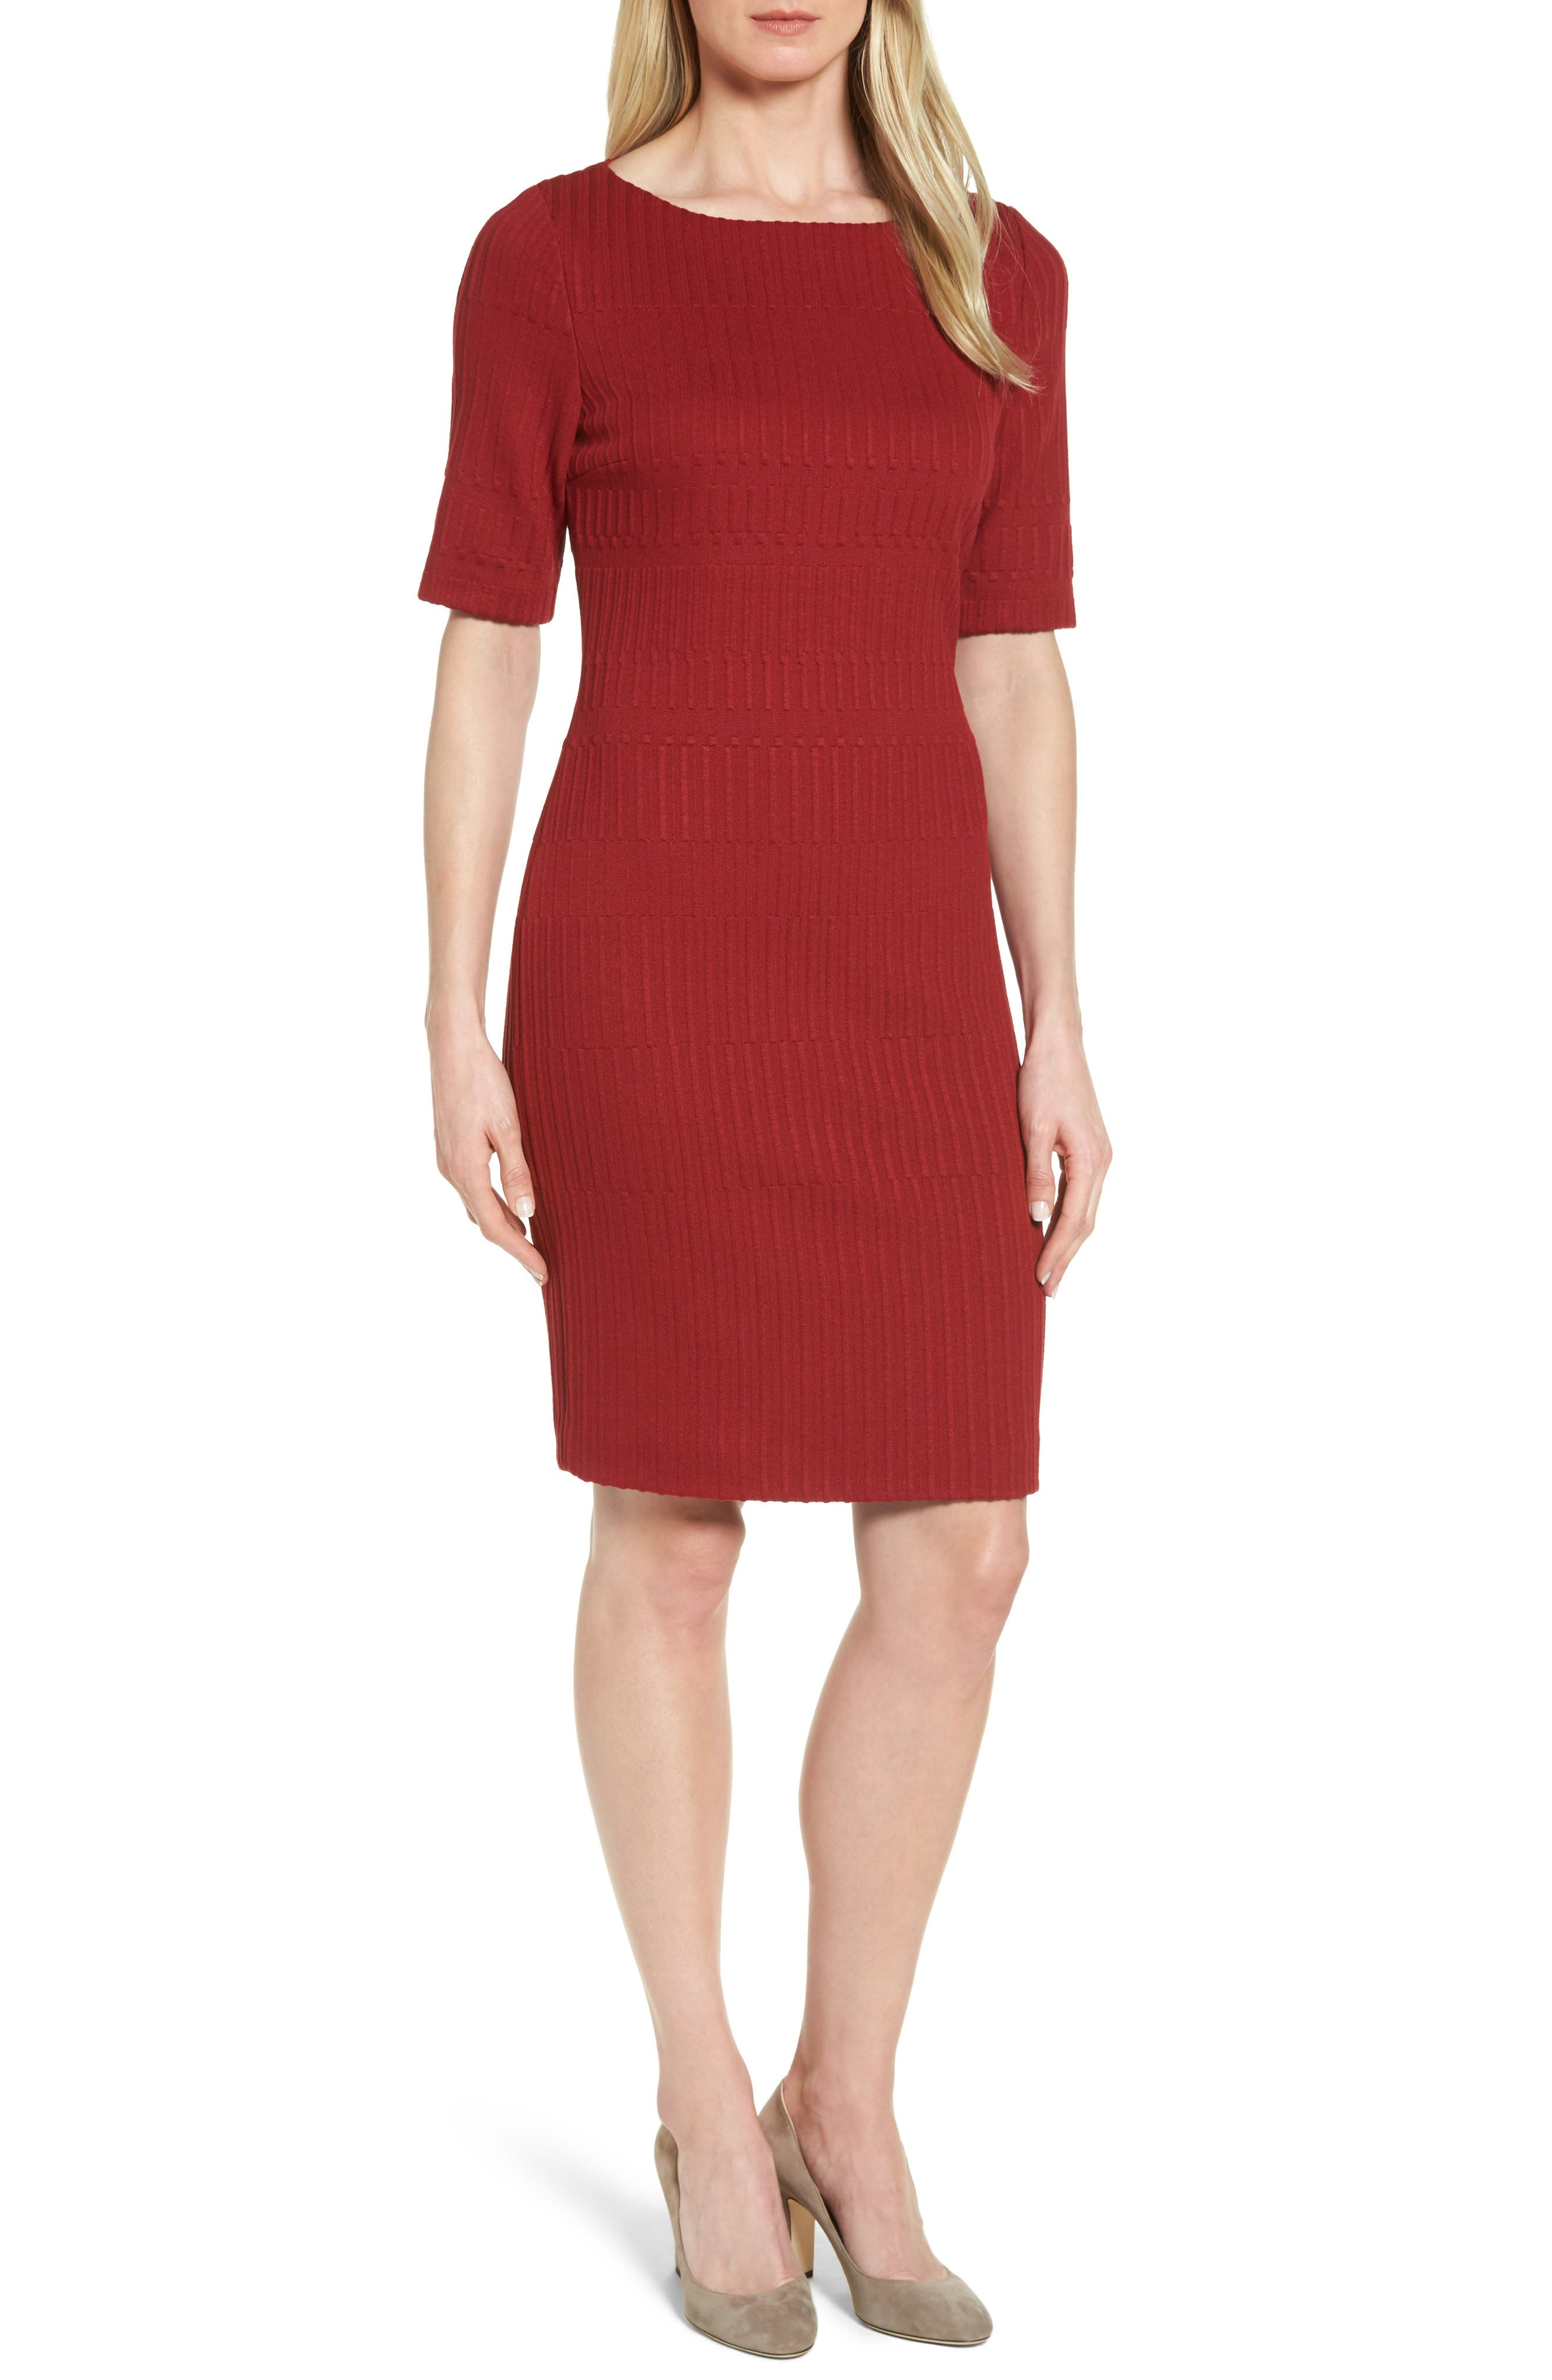 Hadea Knit Sheath Dress,                             Main thumbnail 1, color,                             619